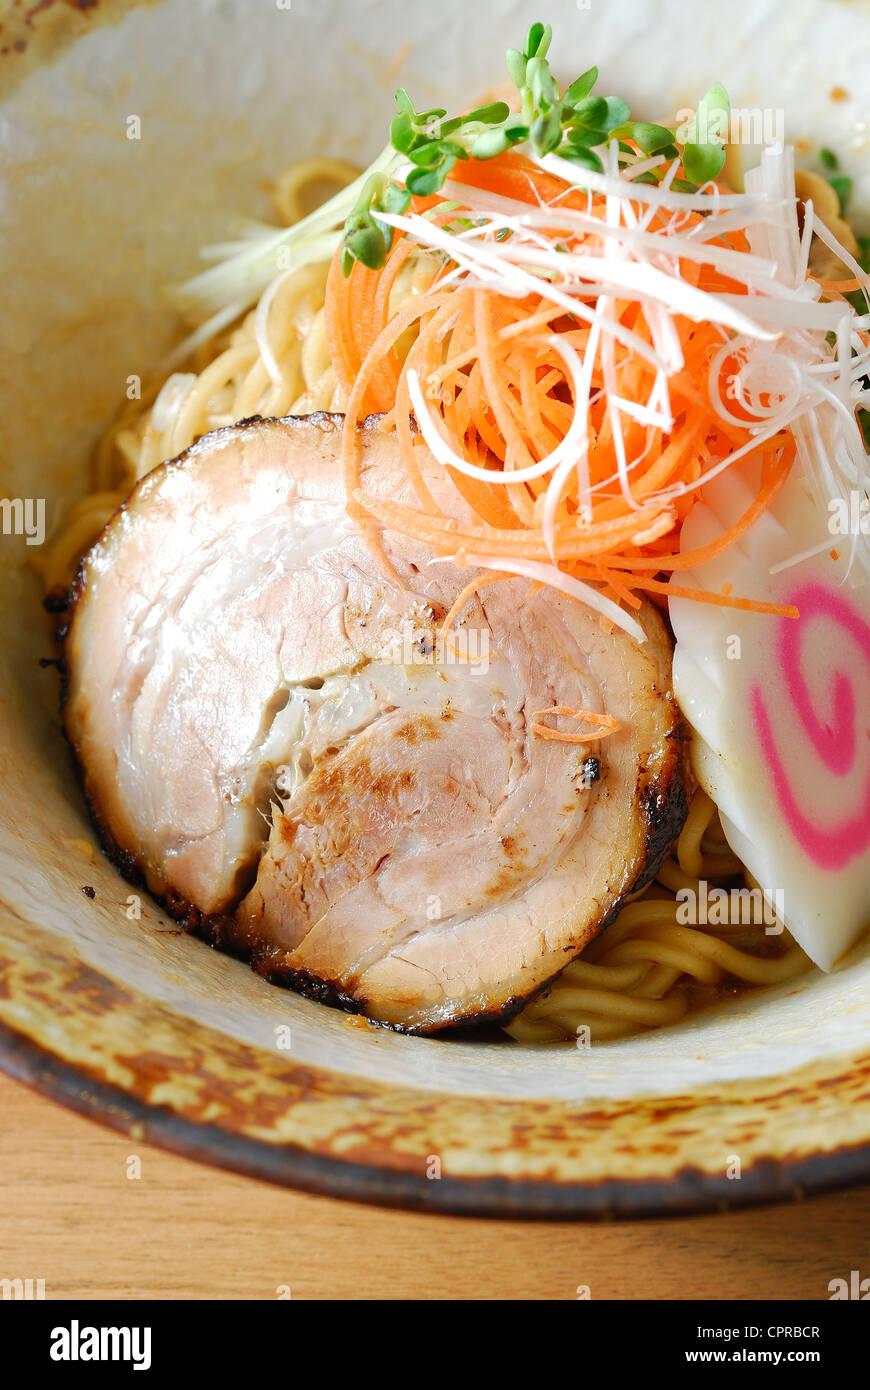 tongkotsu ramen - Stock Image